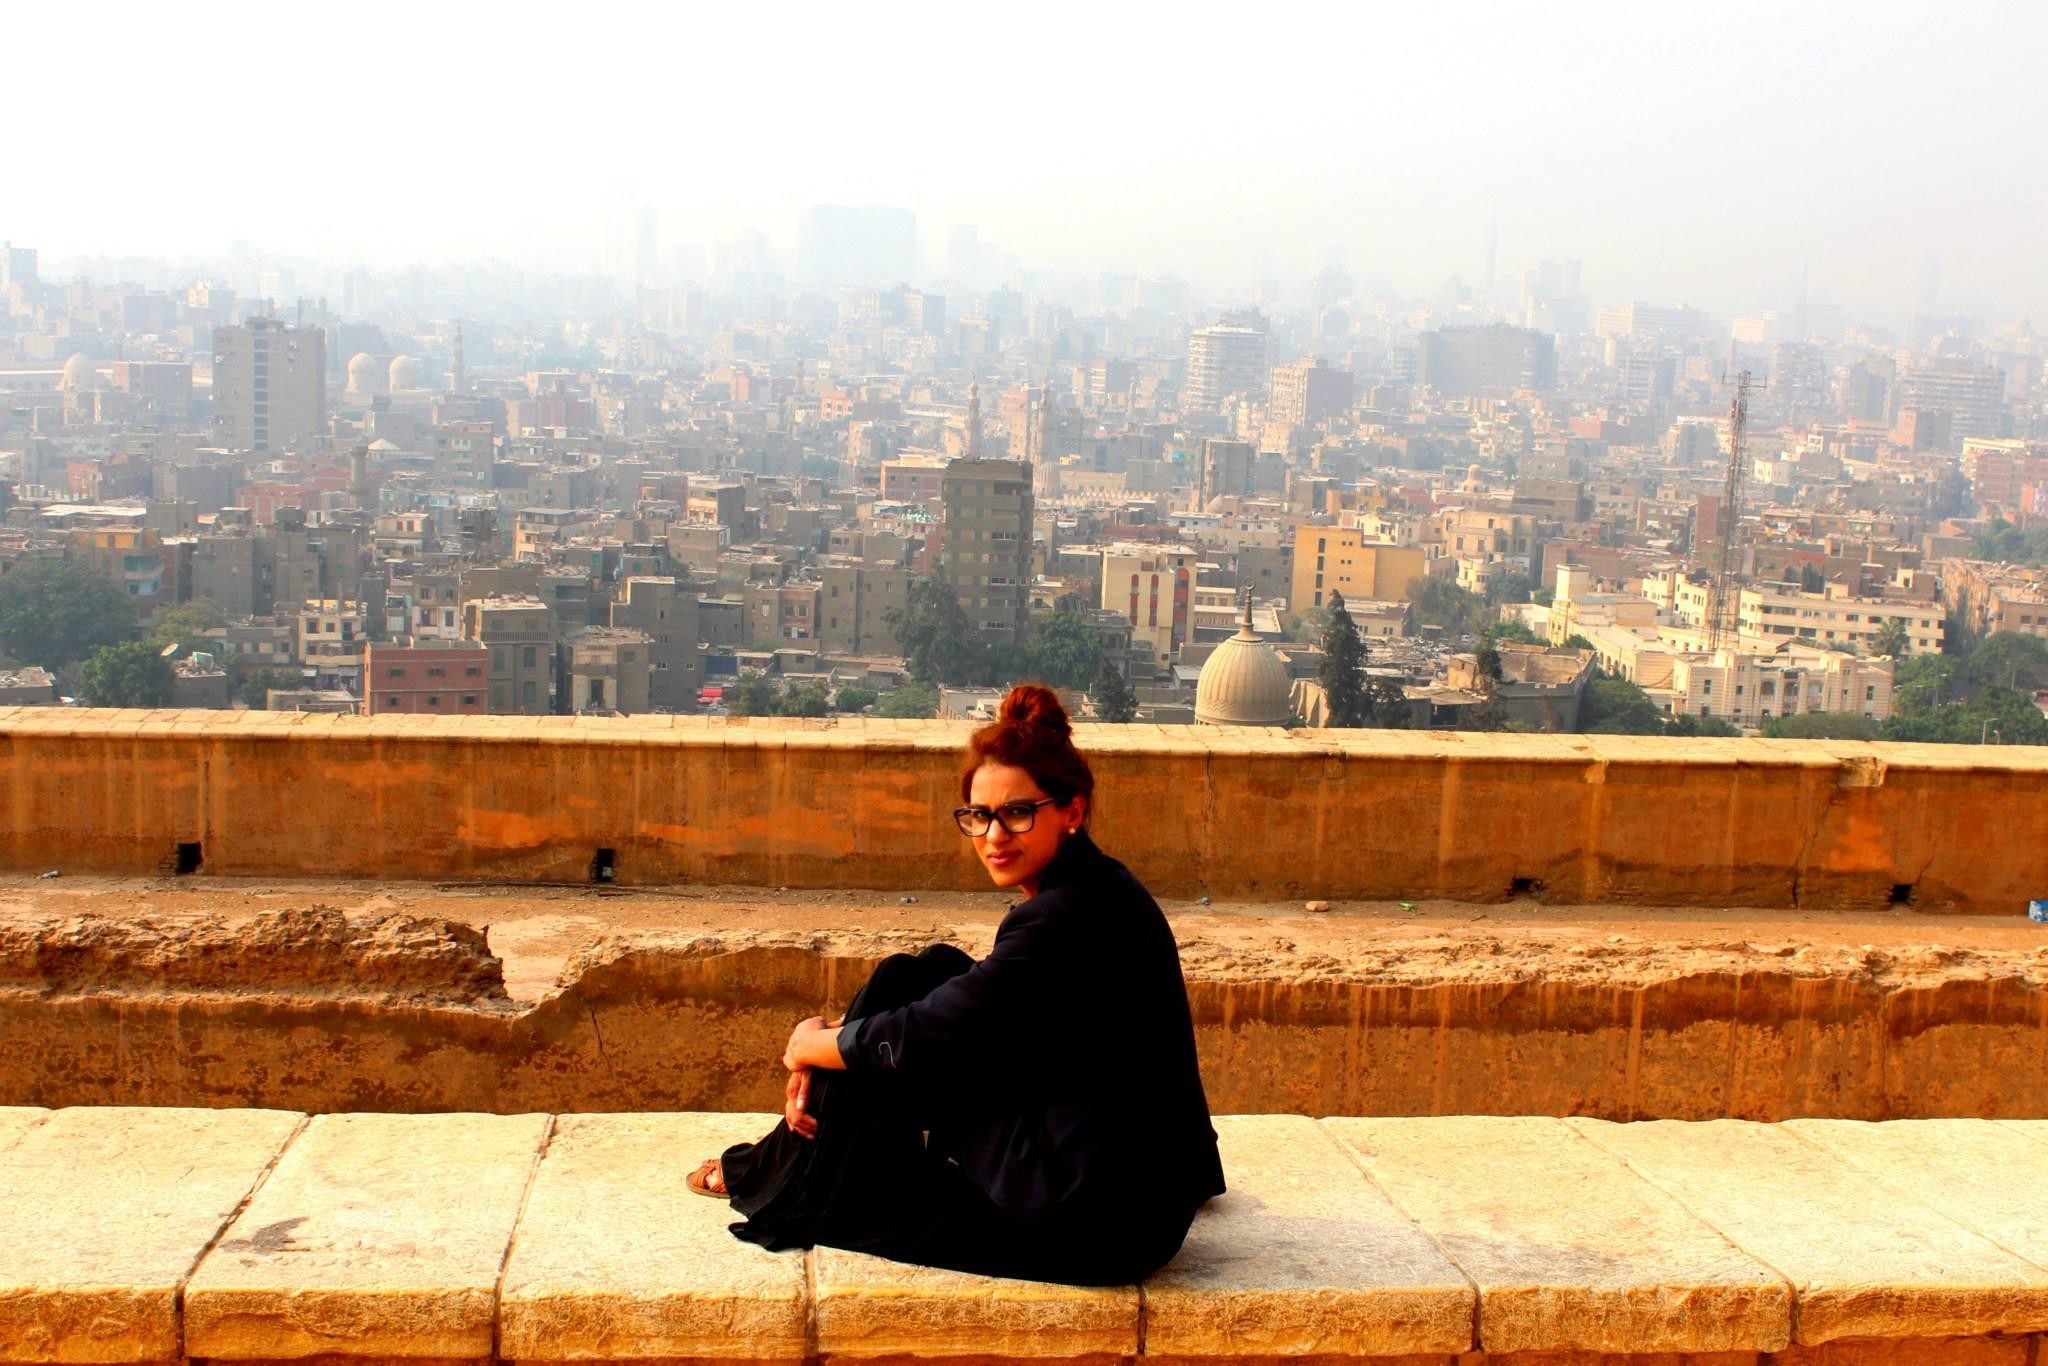 cairo viewpoint